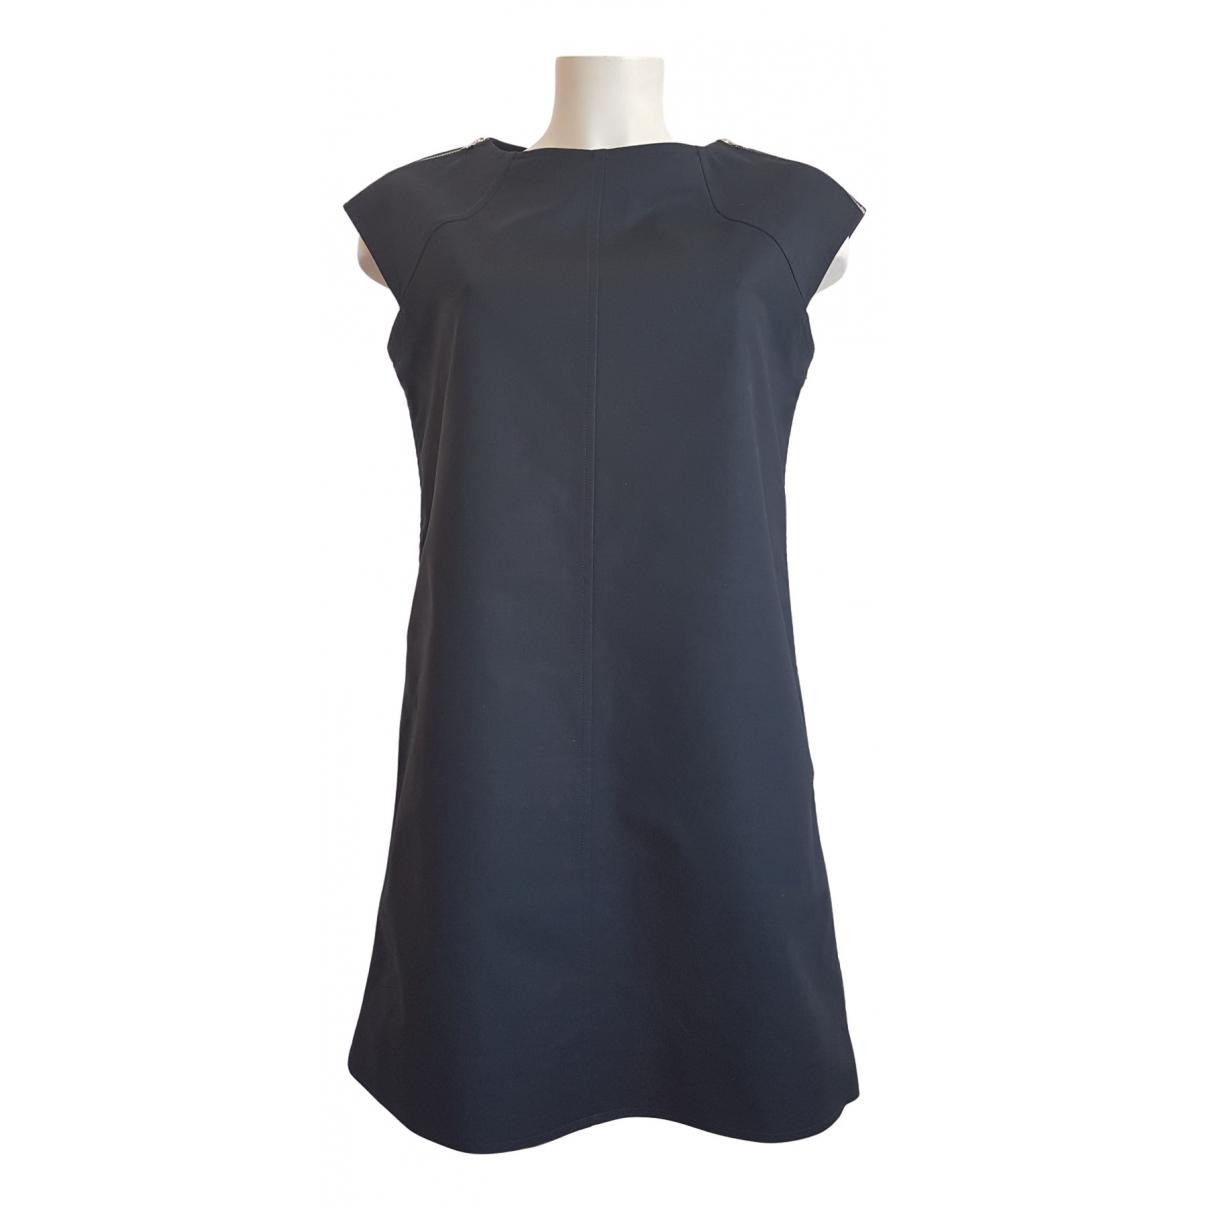 Courreges \N Kleid in  Schwarz Baumwolle - Elasthan